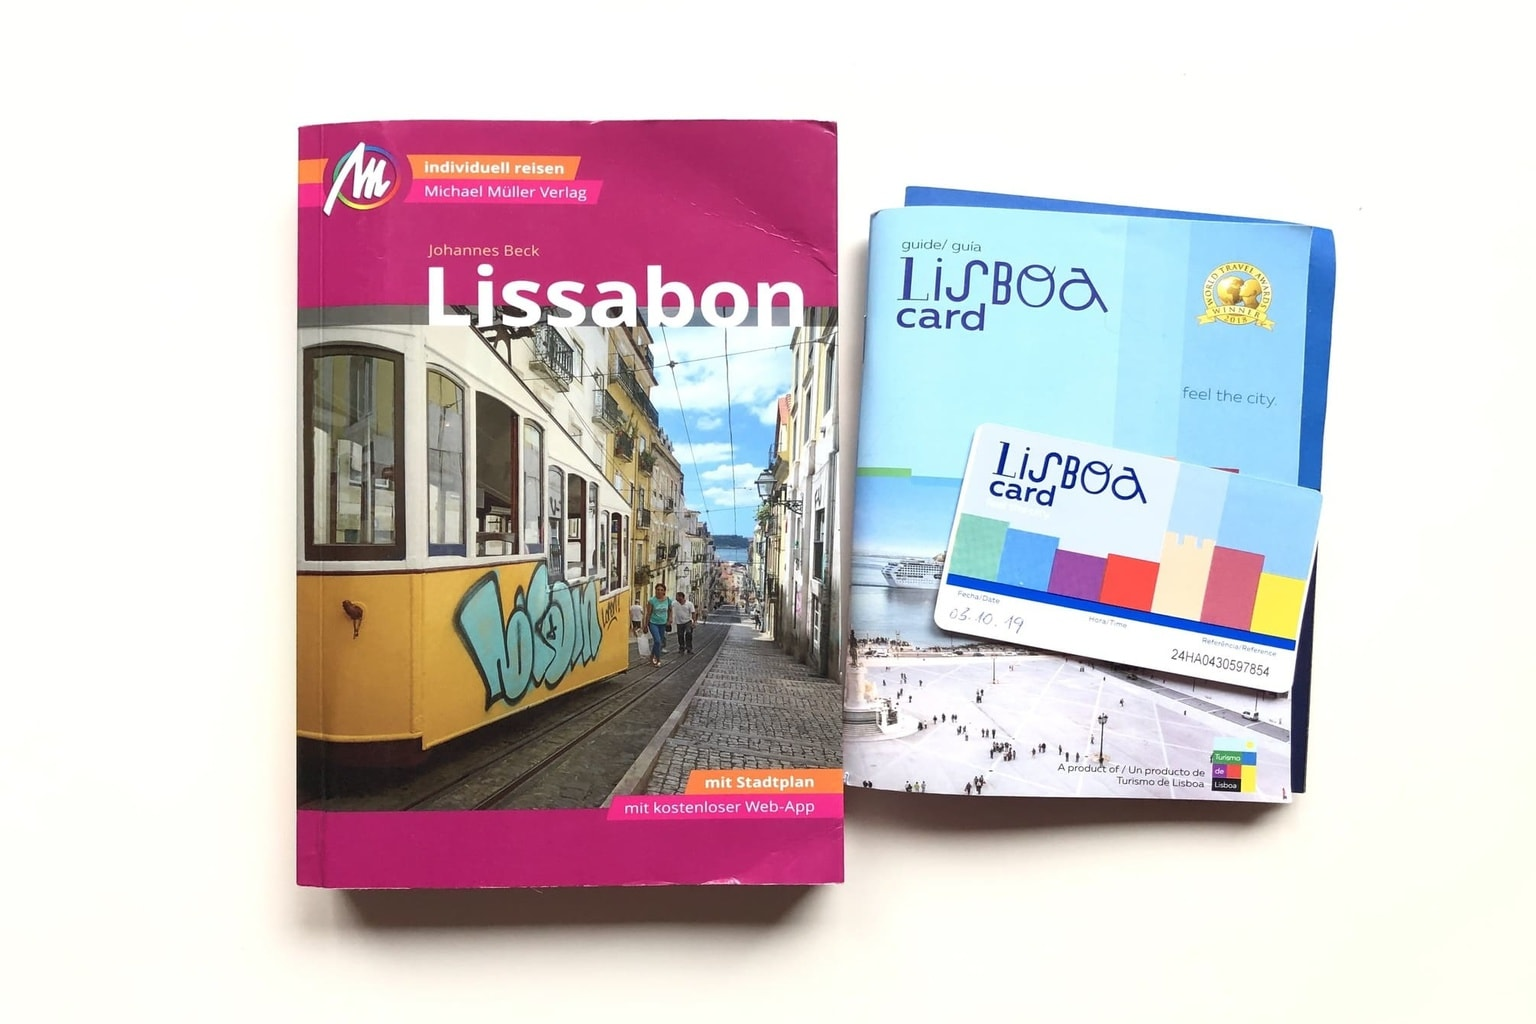 Lissabon Reiseführer und Lisboa Card